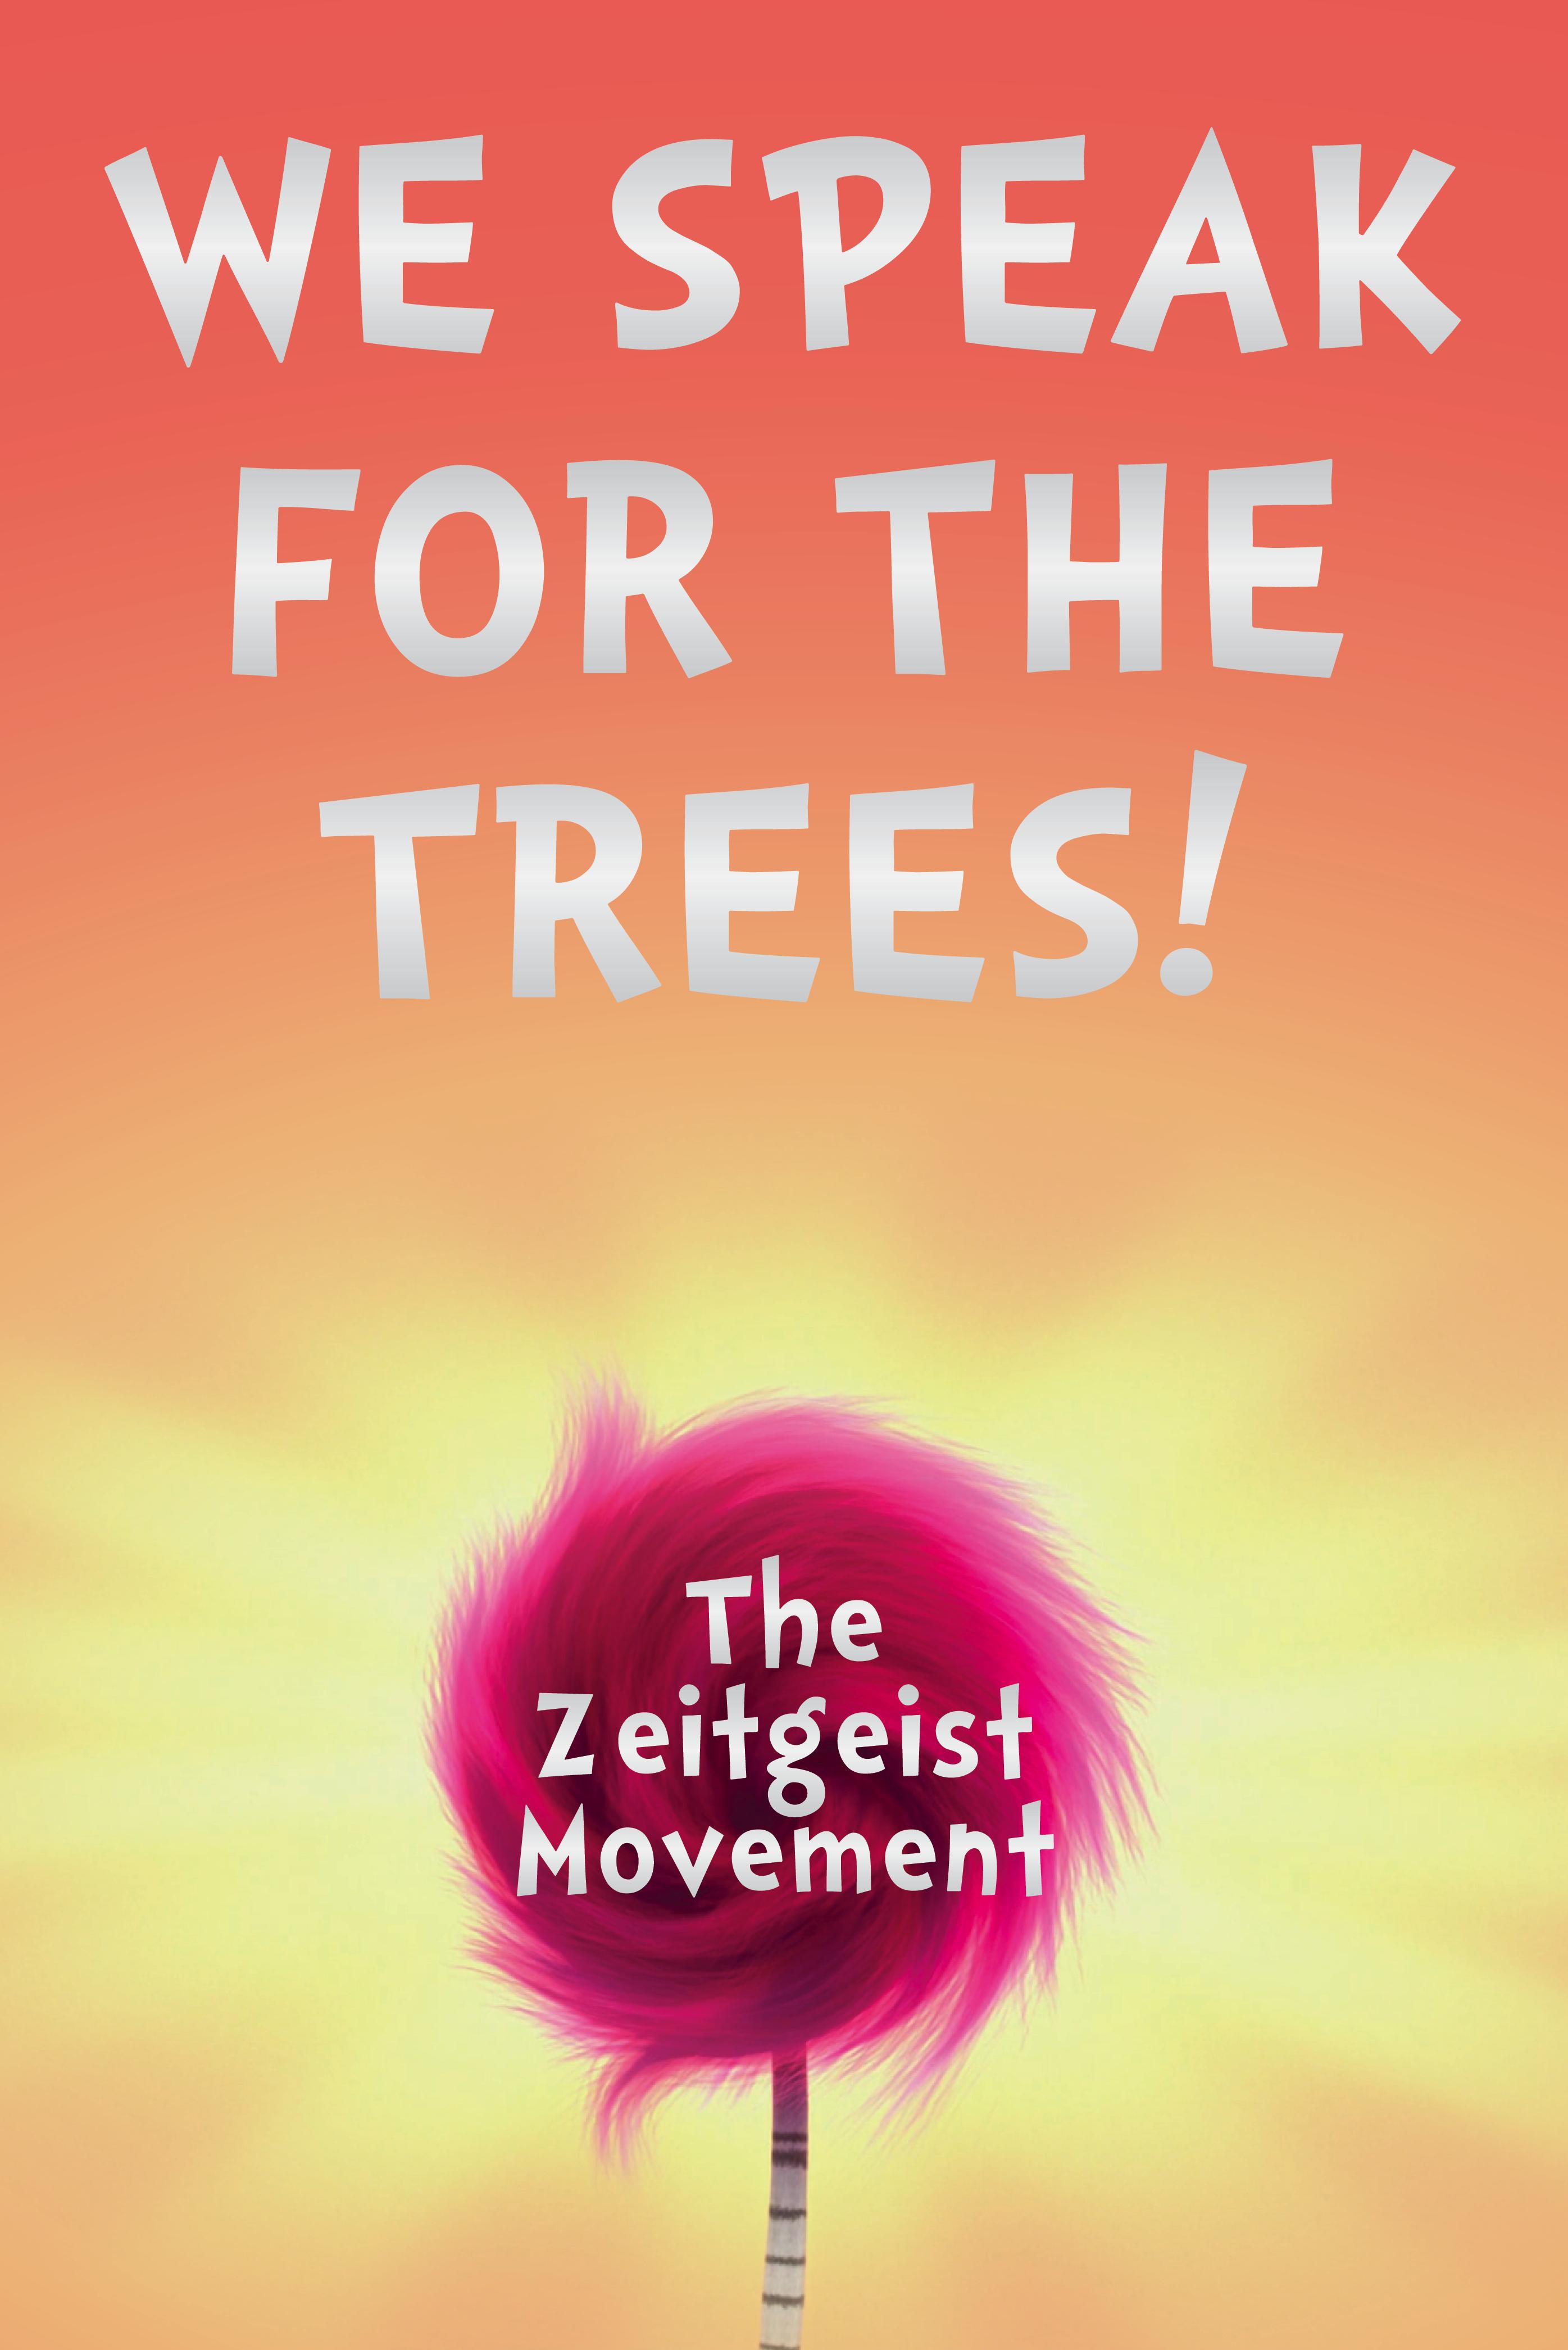 We Speak Fashionicano Best Fashion Magazines Covers: We Speak For The Trees! Zeitgeist Movement